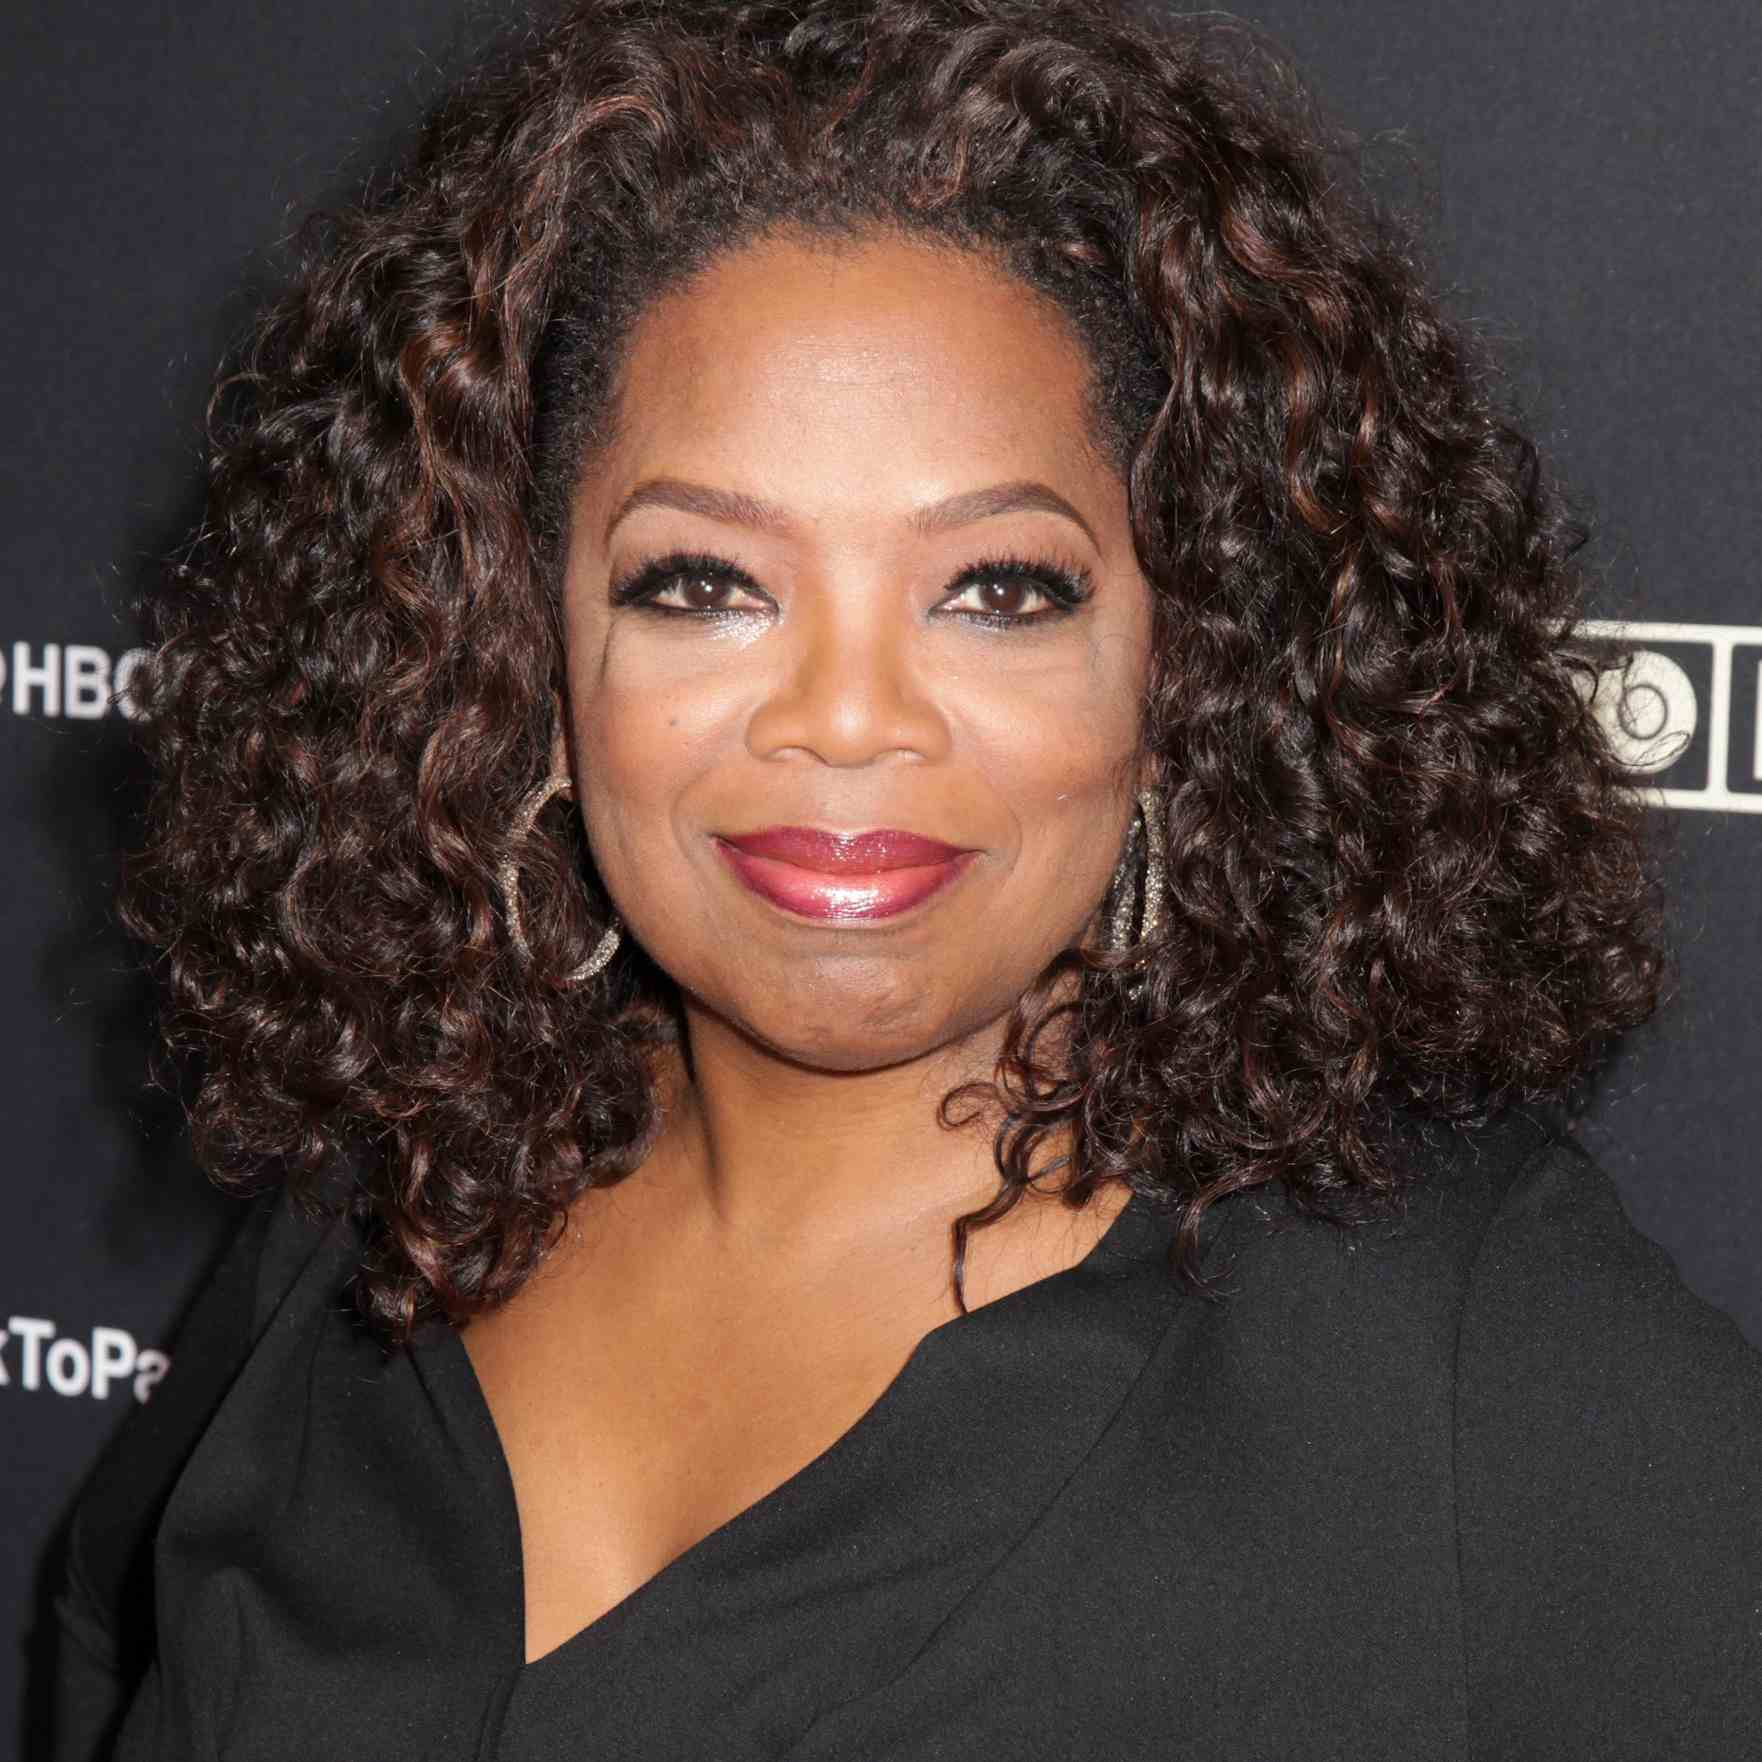 Oprah Winfrey with curly hair